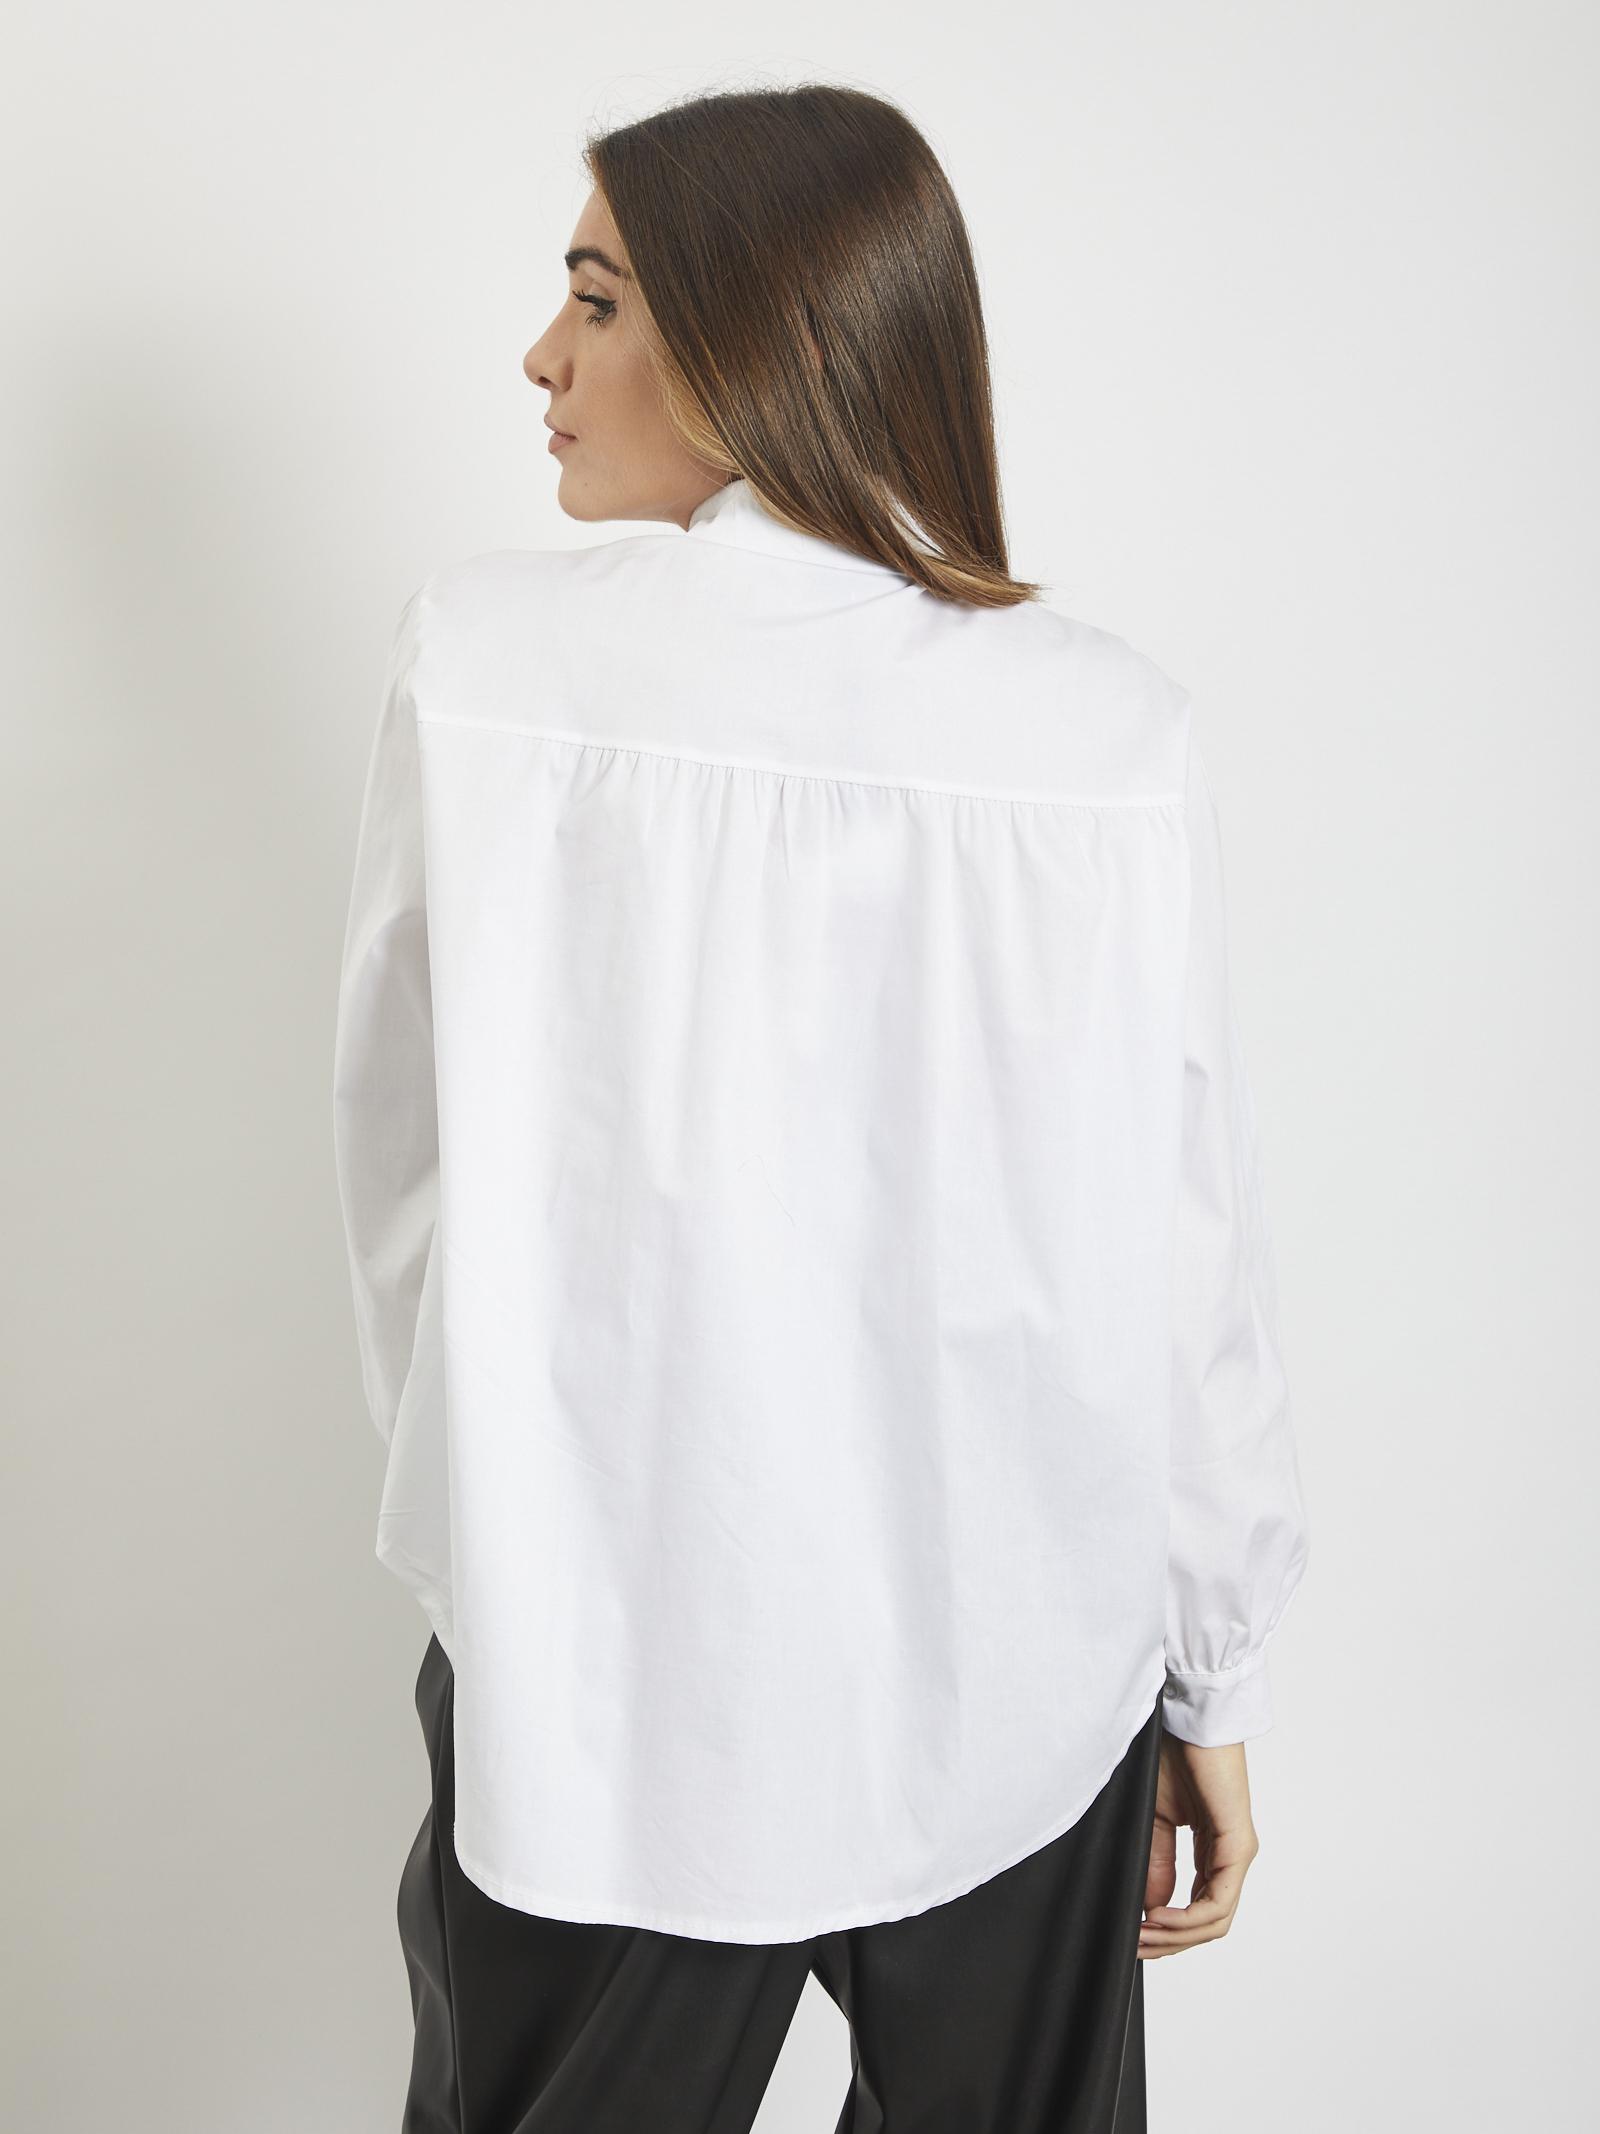 Shirt ODI ODI | Shirts | OLIVEBIANCO